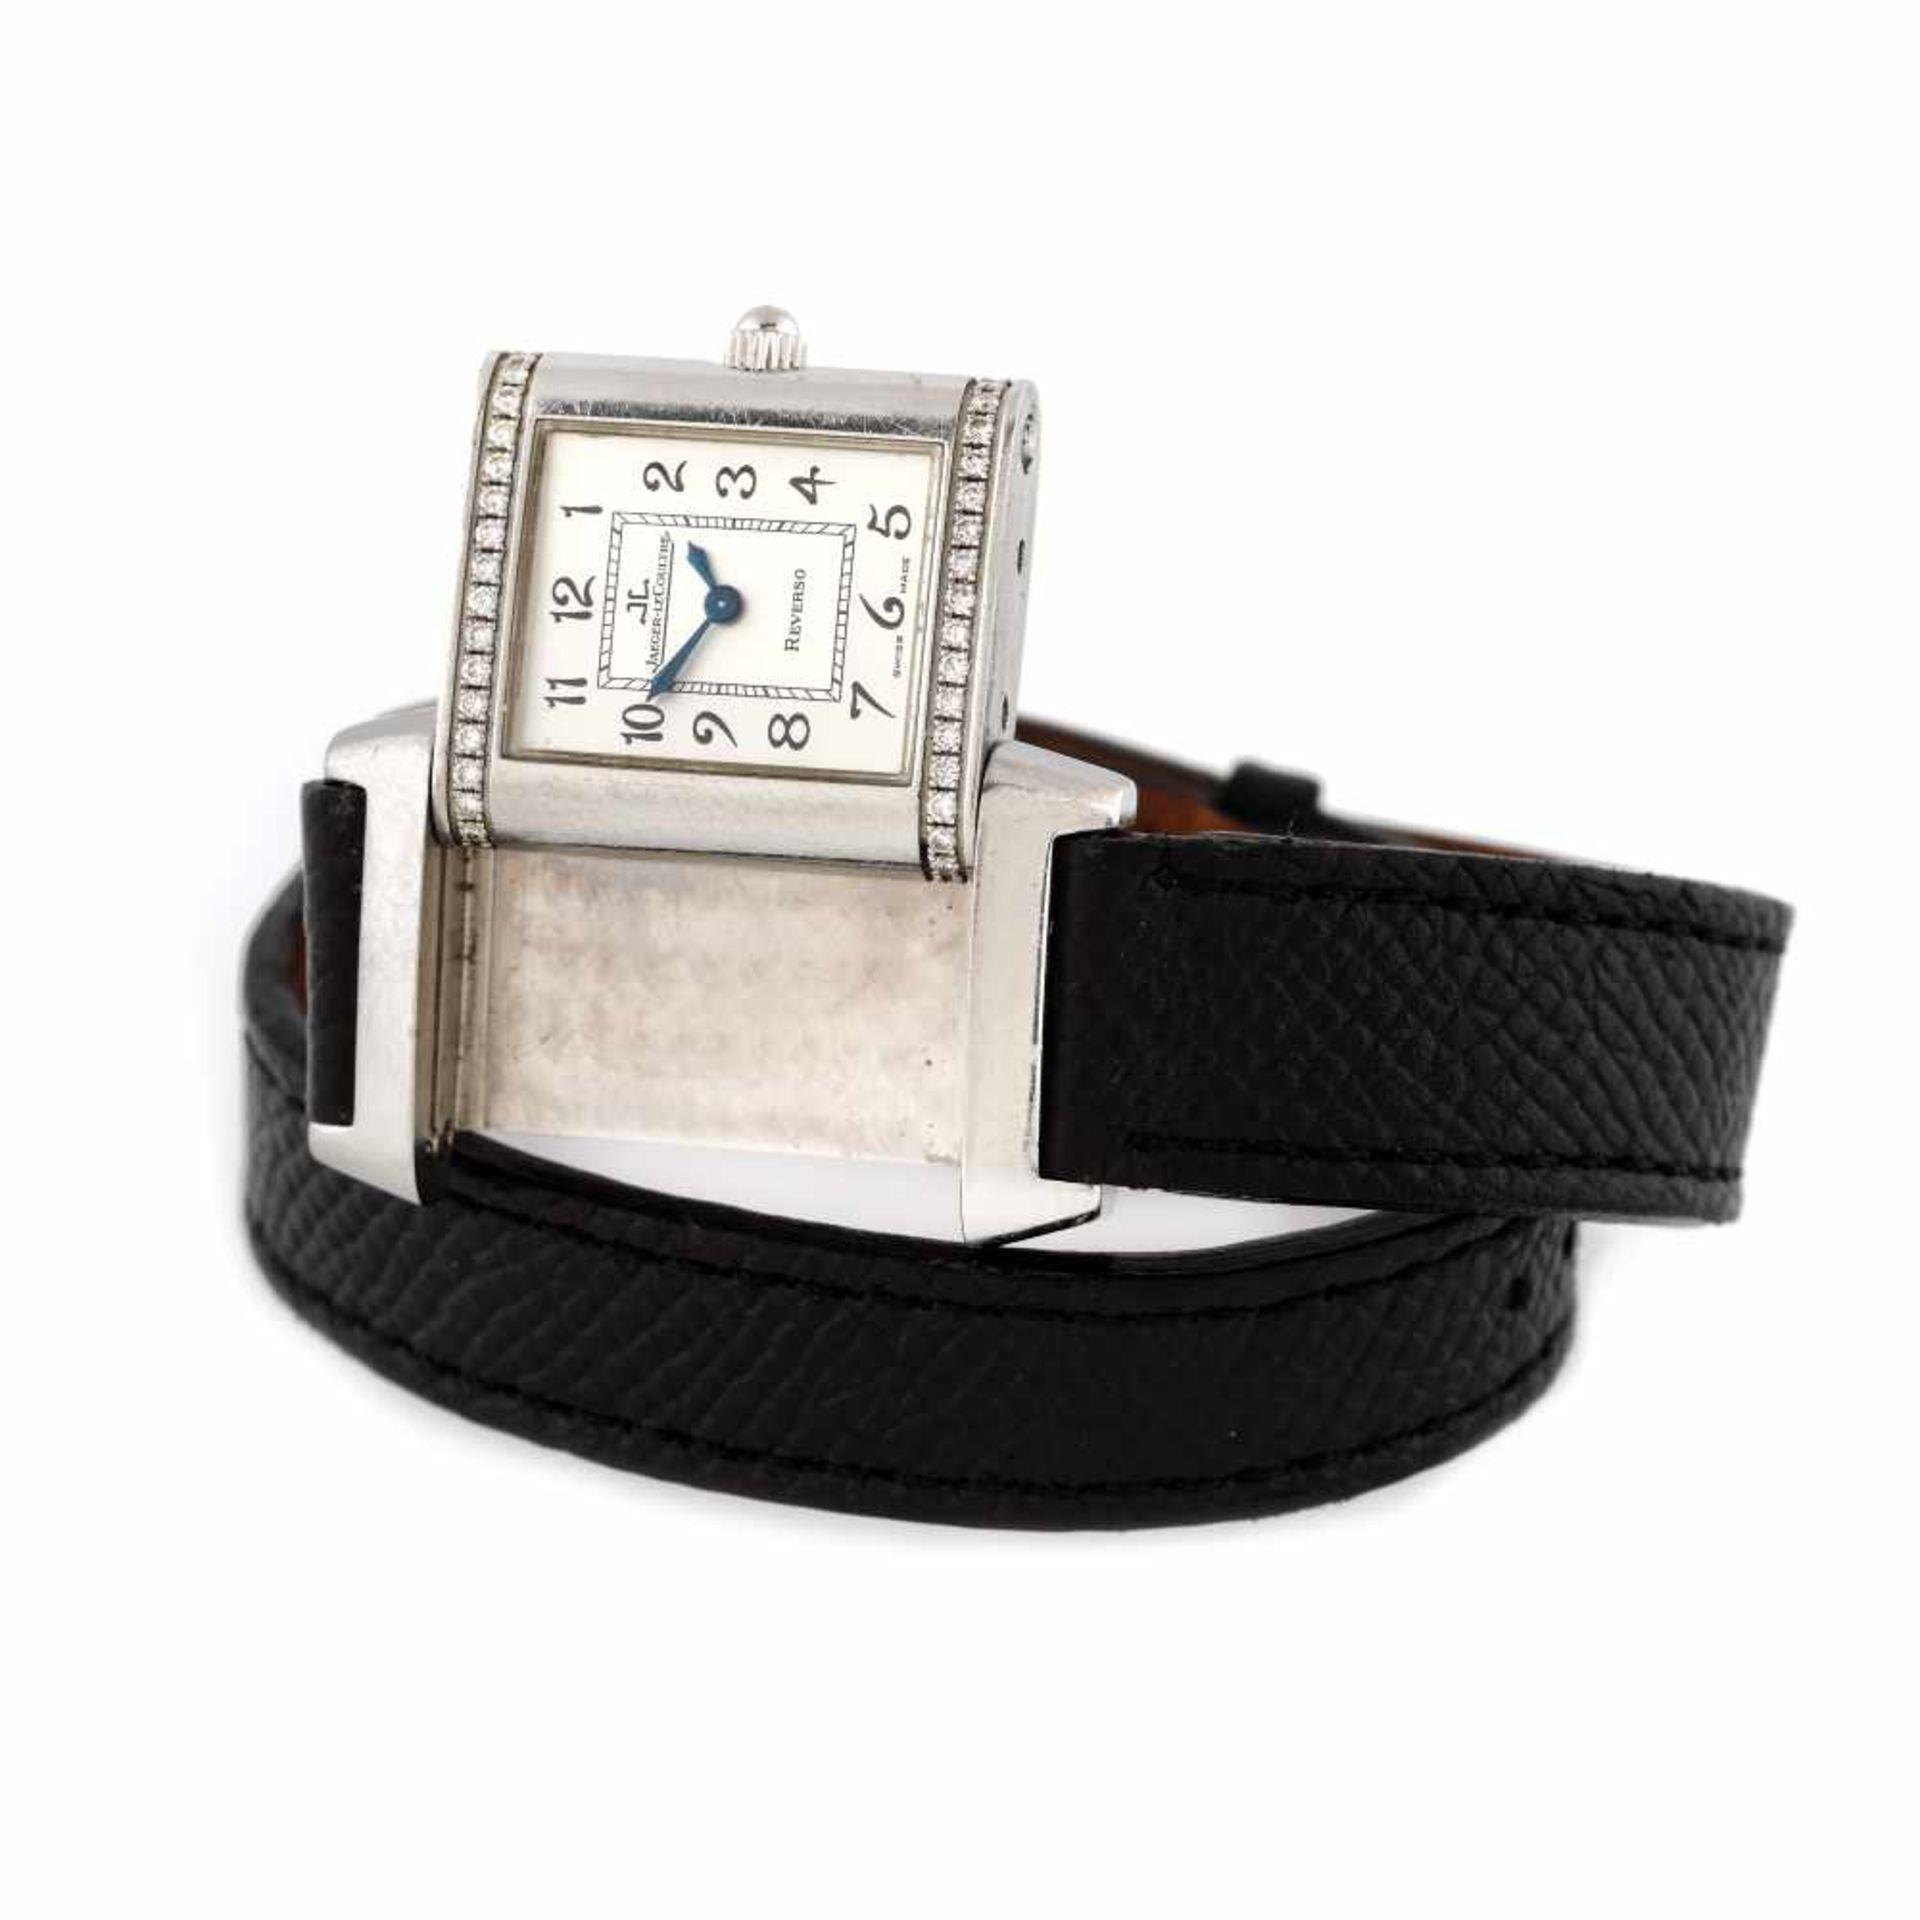 Jaeger-LeCoultre Reverso wristwatch, women, decorated with diamonds - Bild 2 aus 4